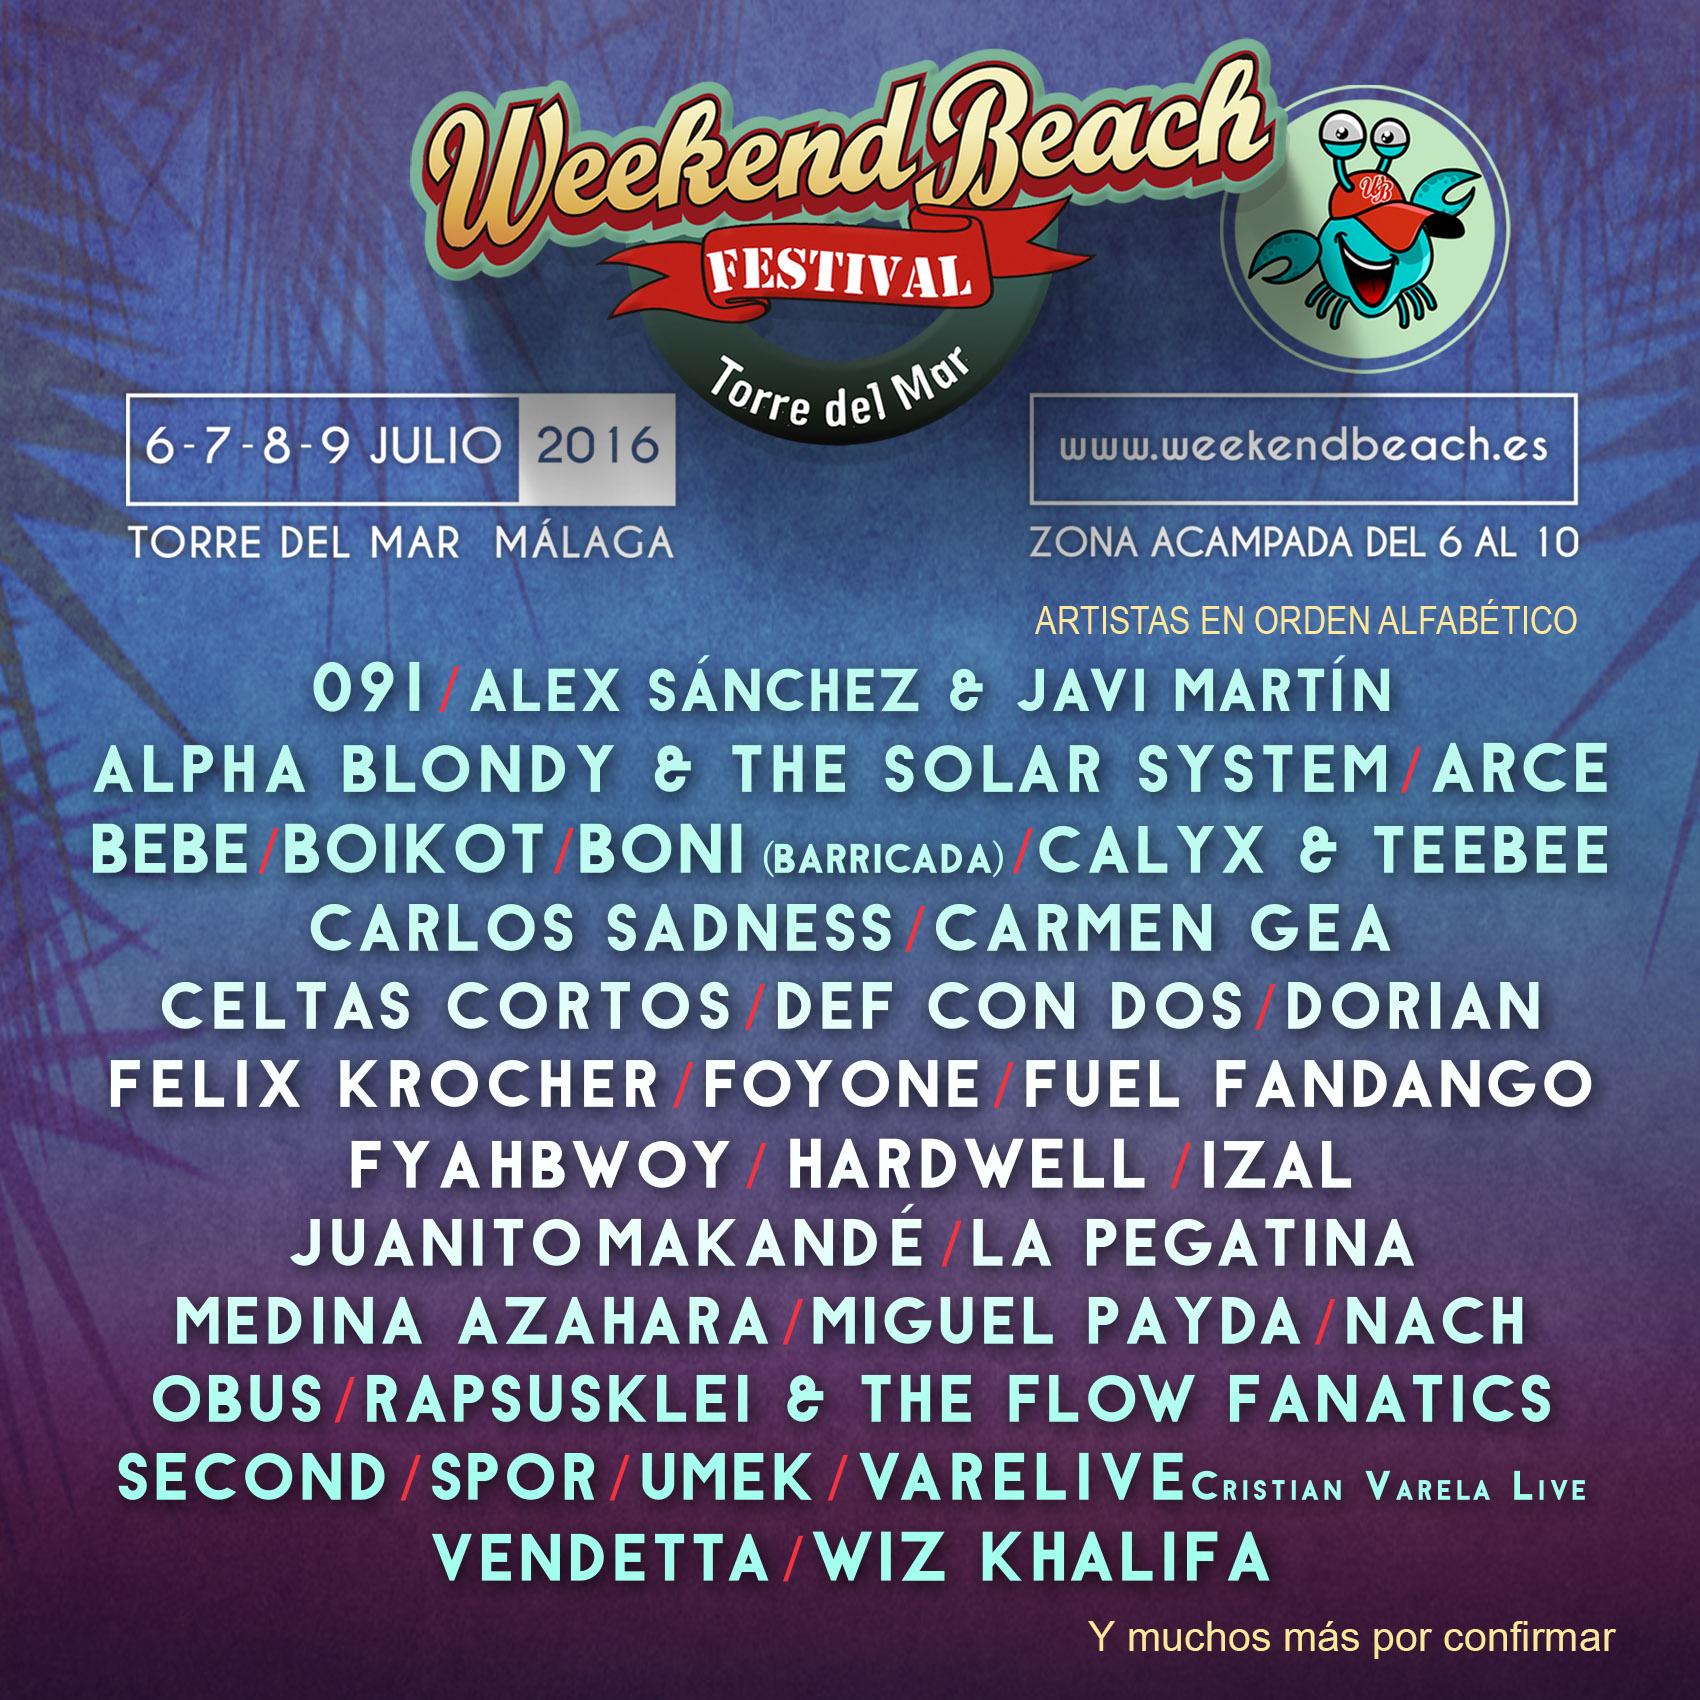 Weekend Beach Festival 2016